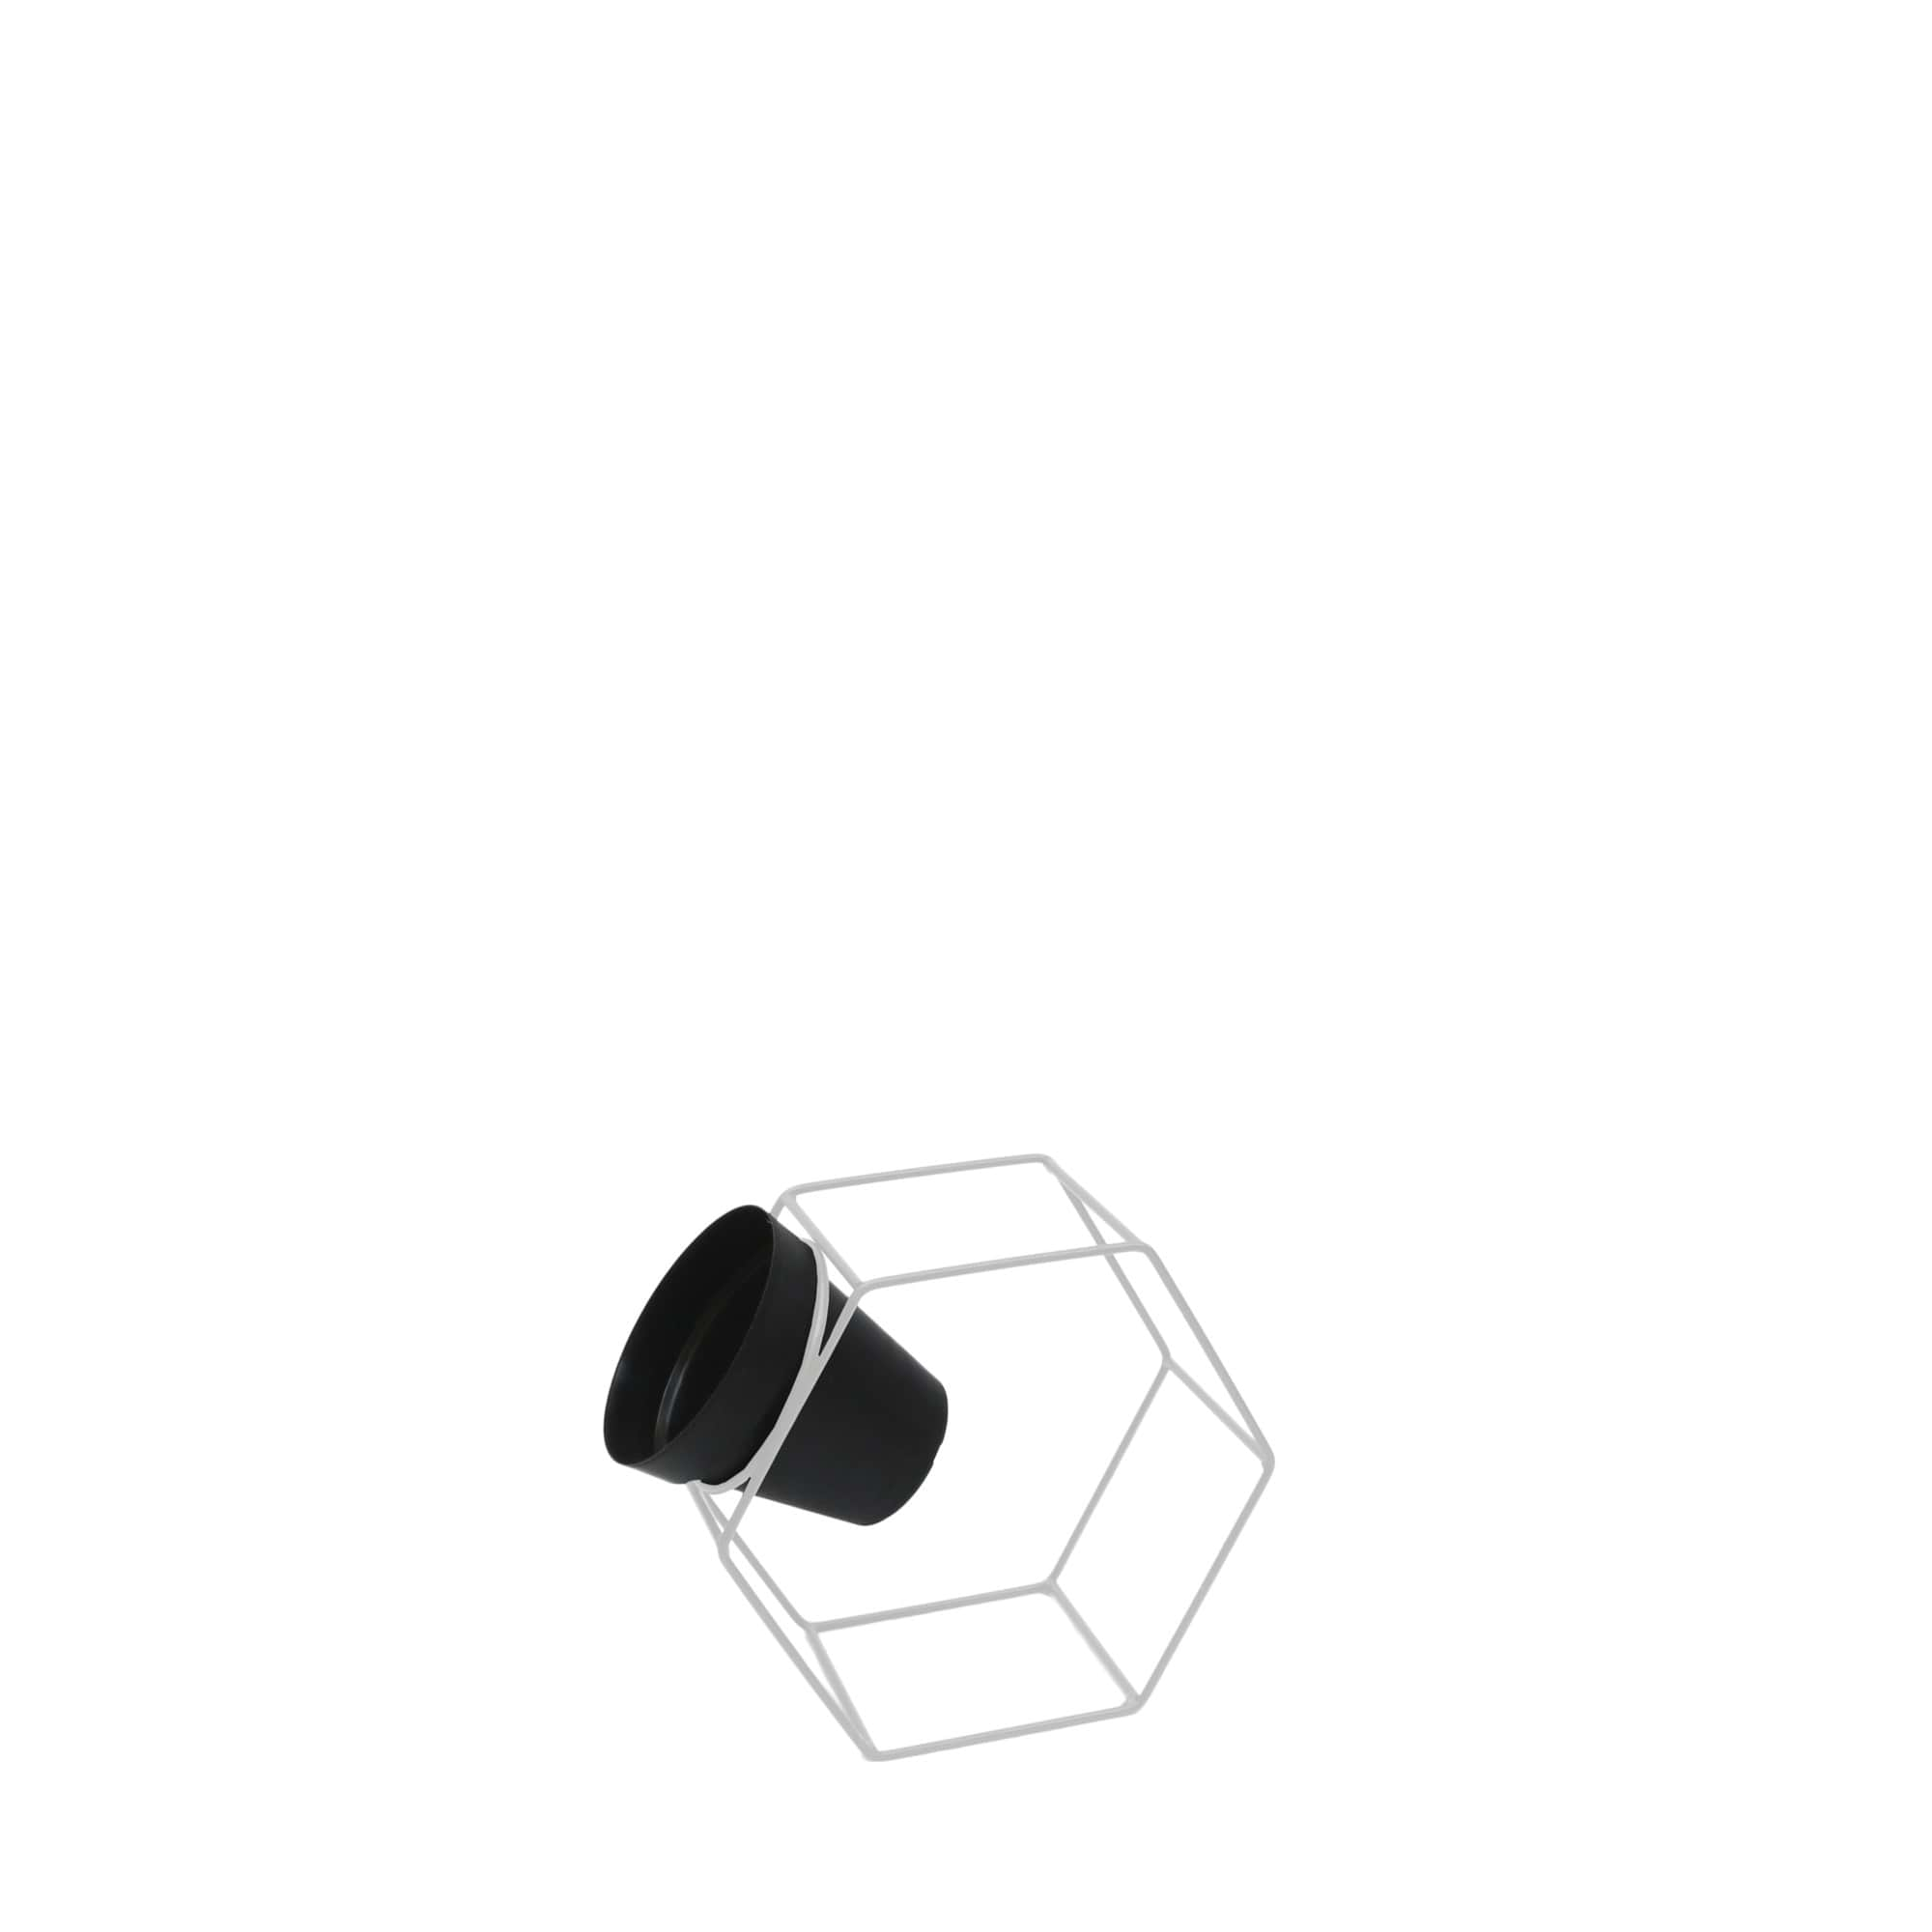 Suporte Ferro Sextavado Parede 27 x 24 cm Branco Vasart